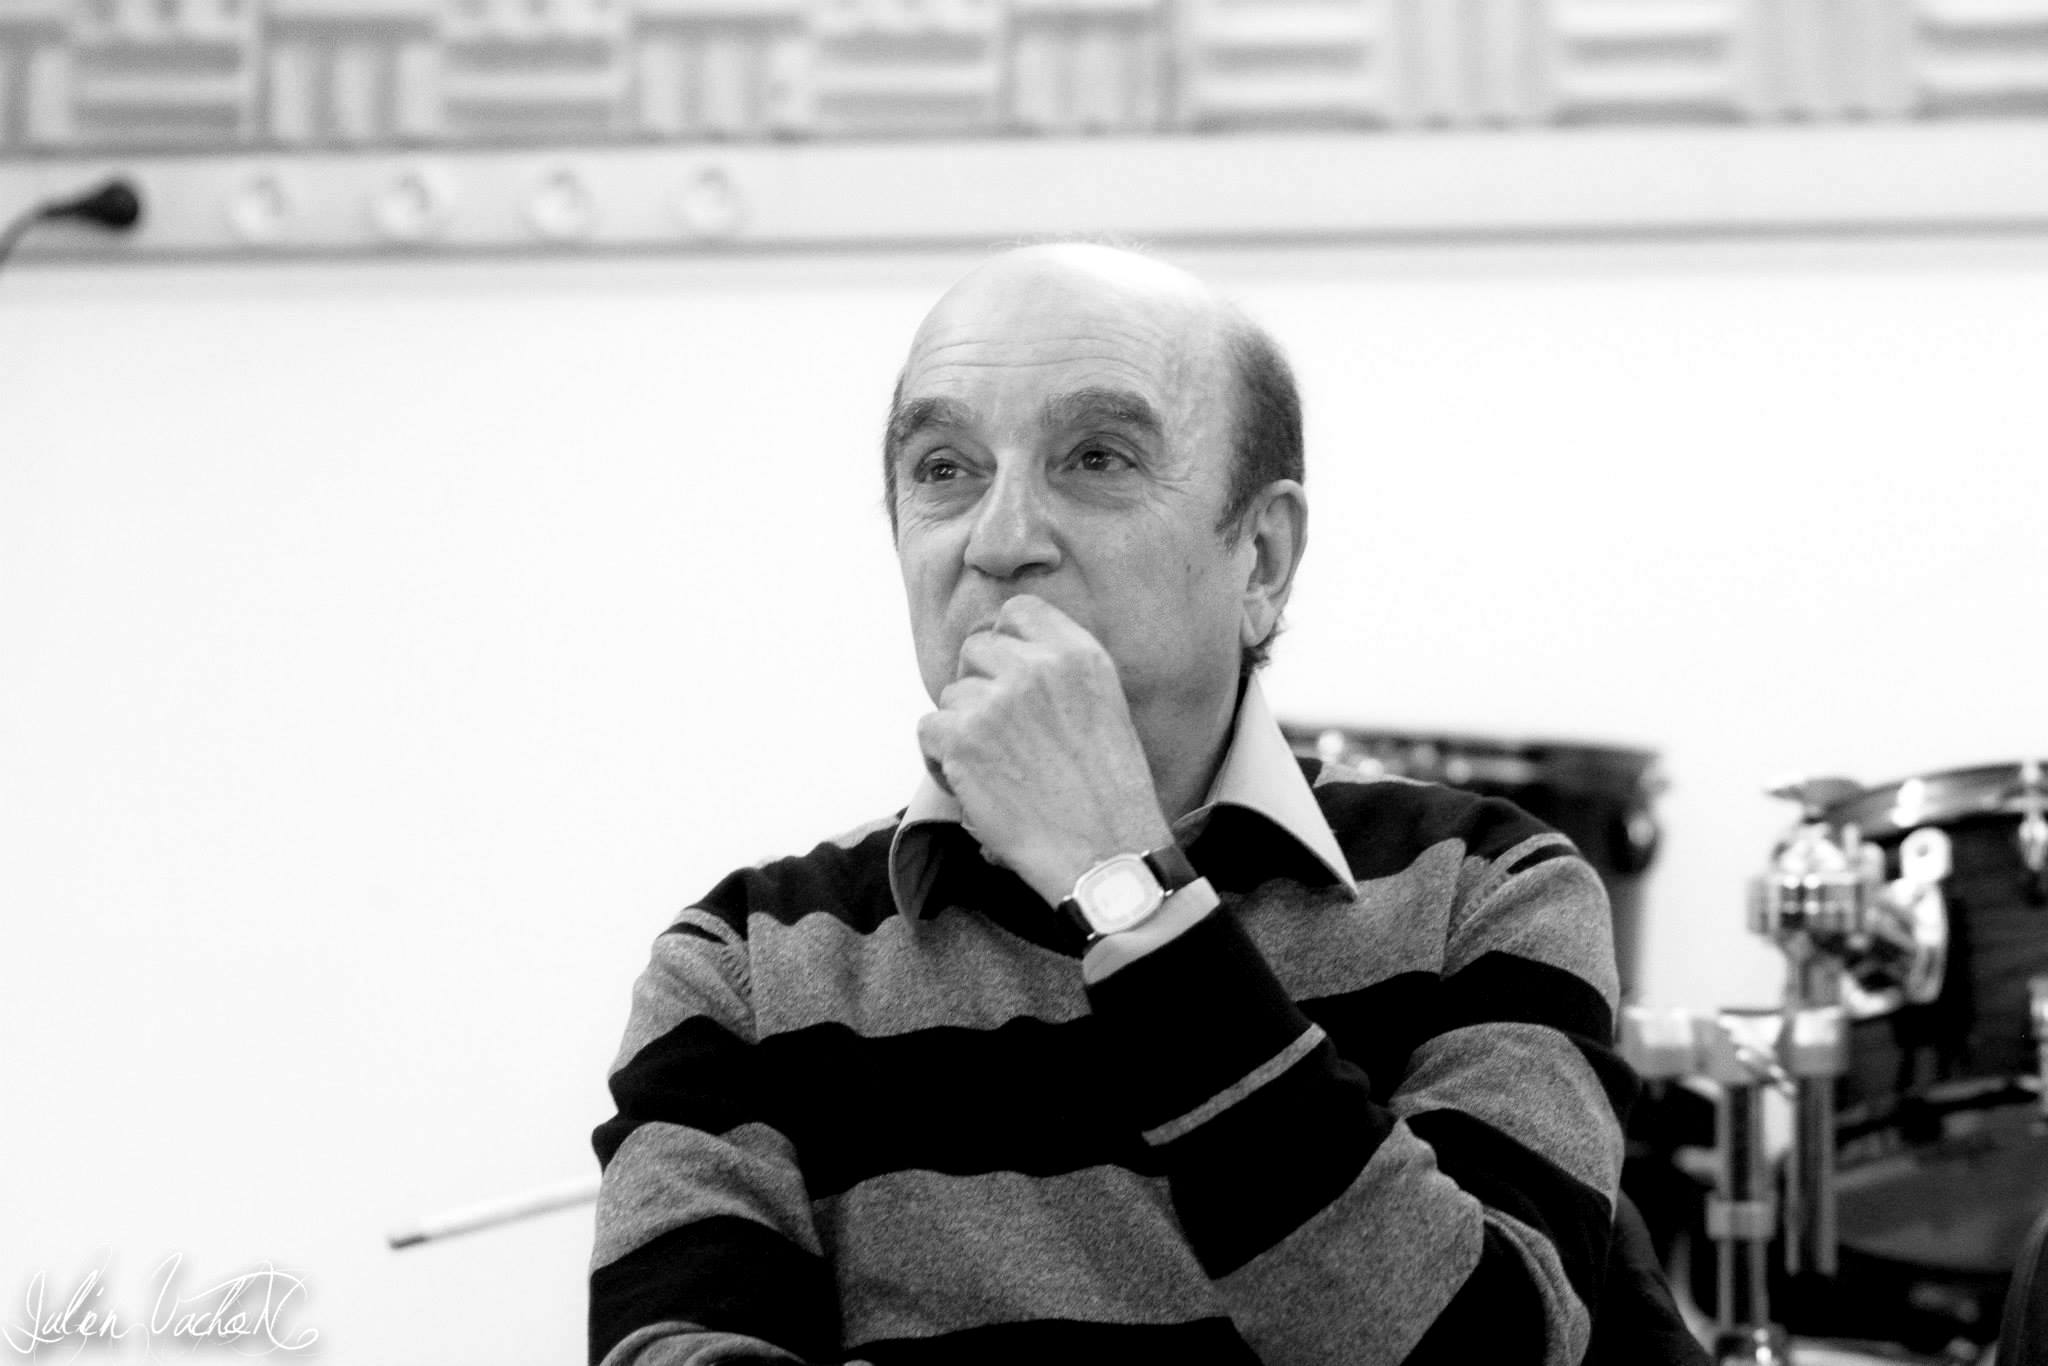 Jeff Barnel